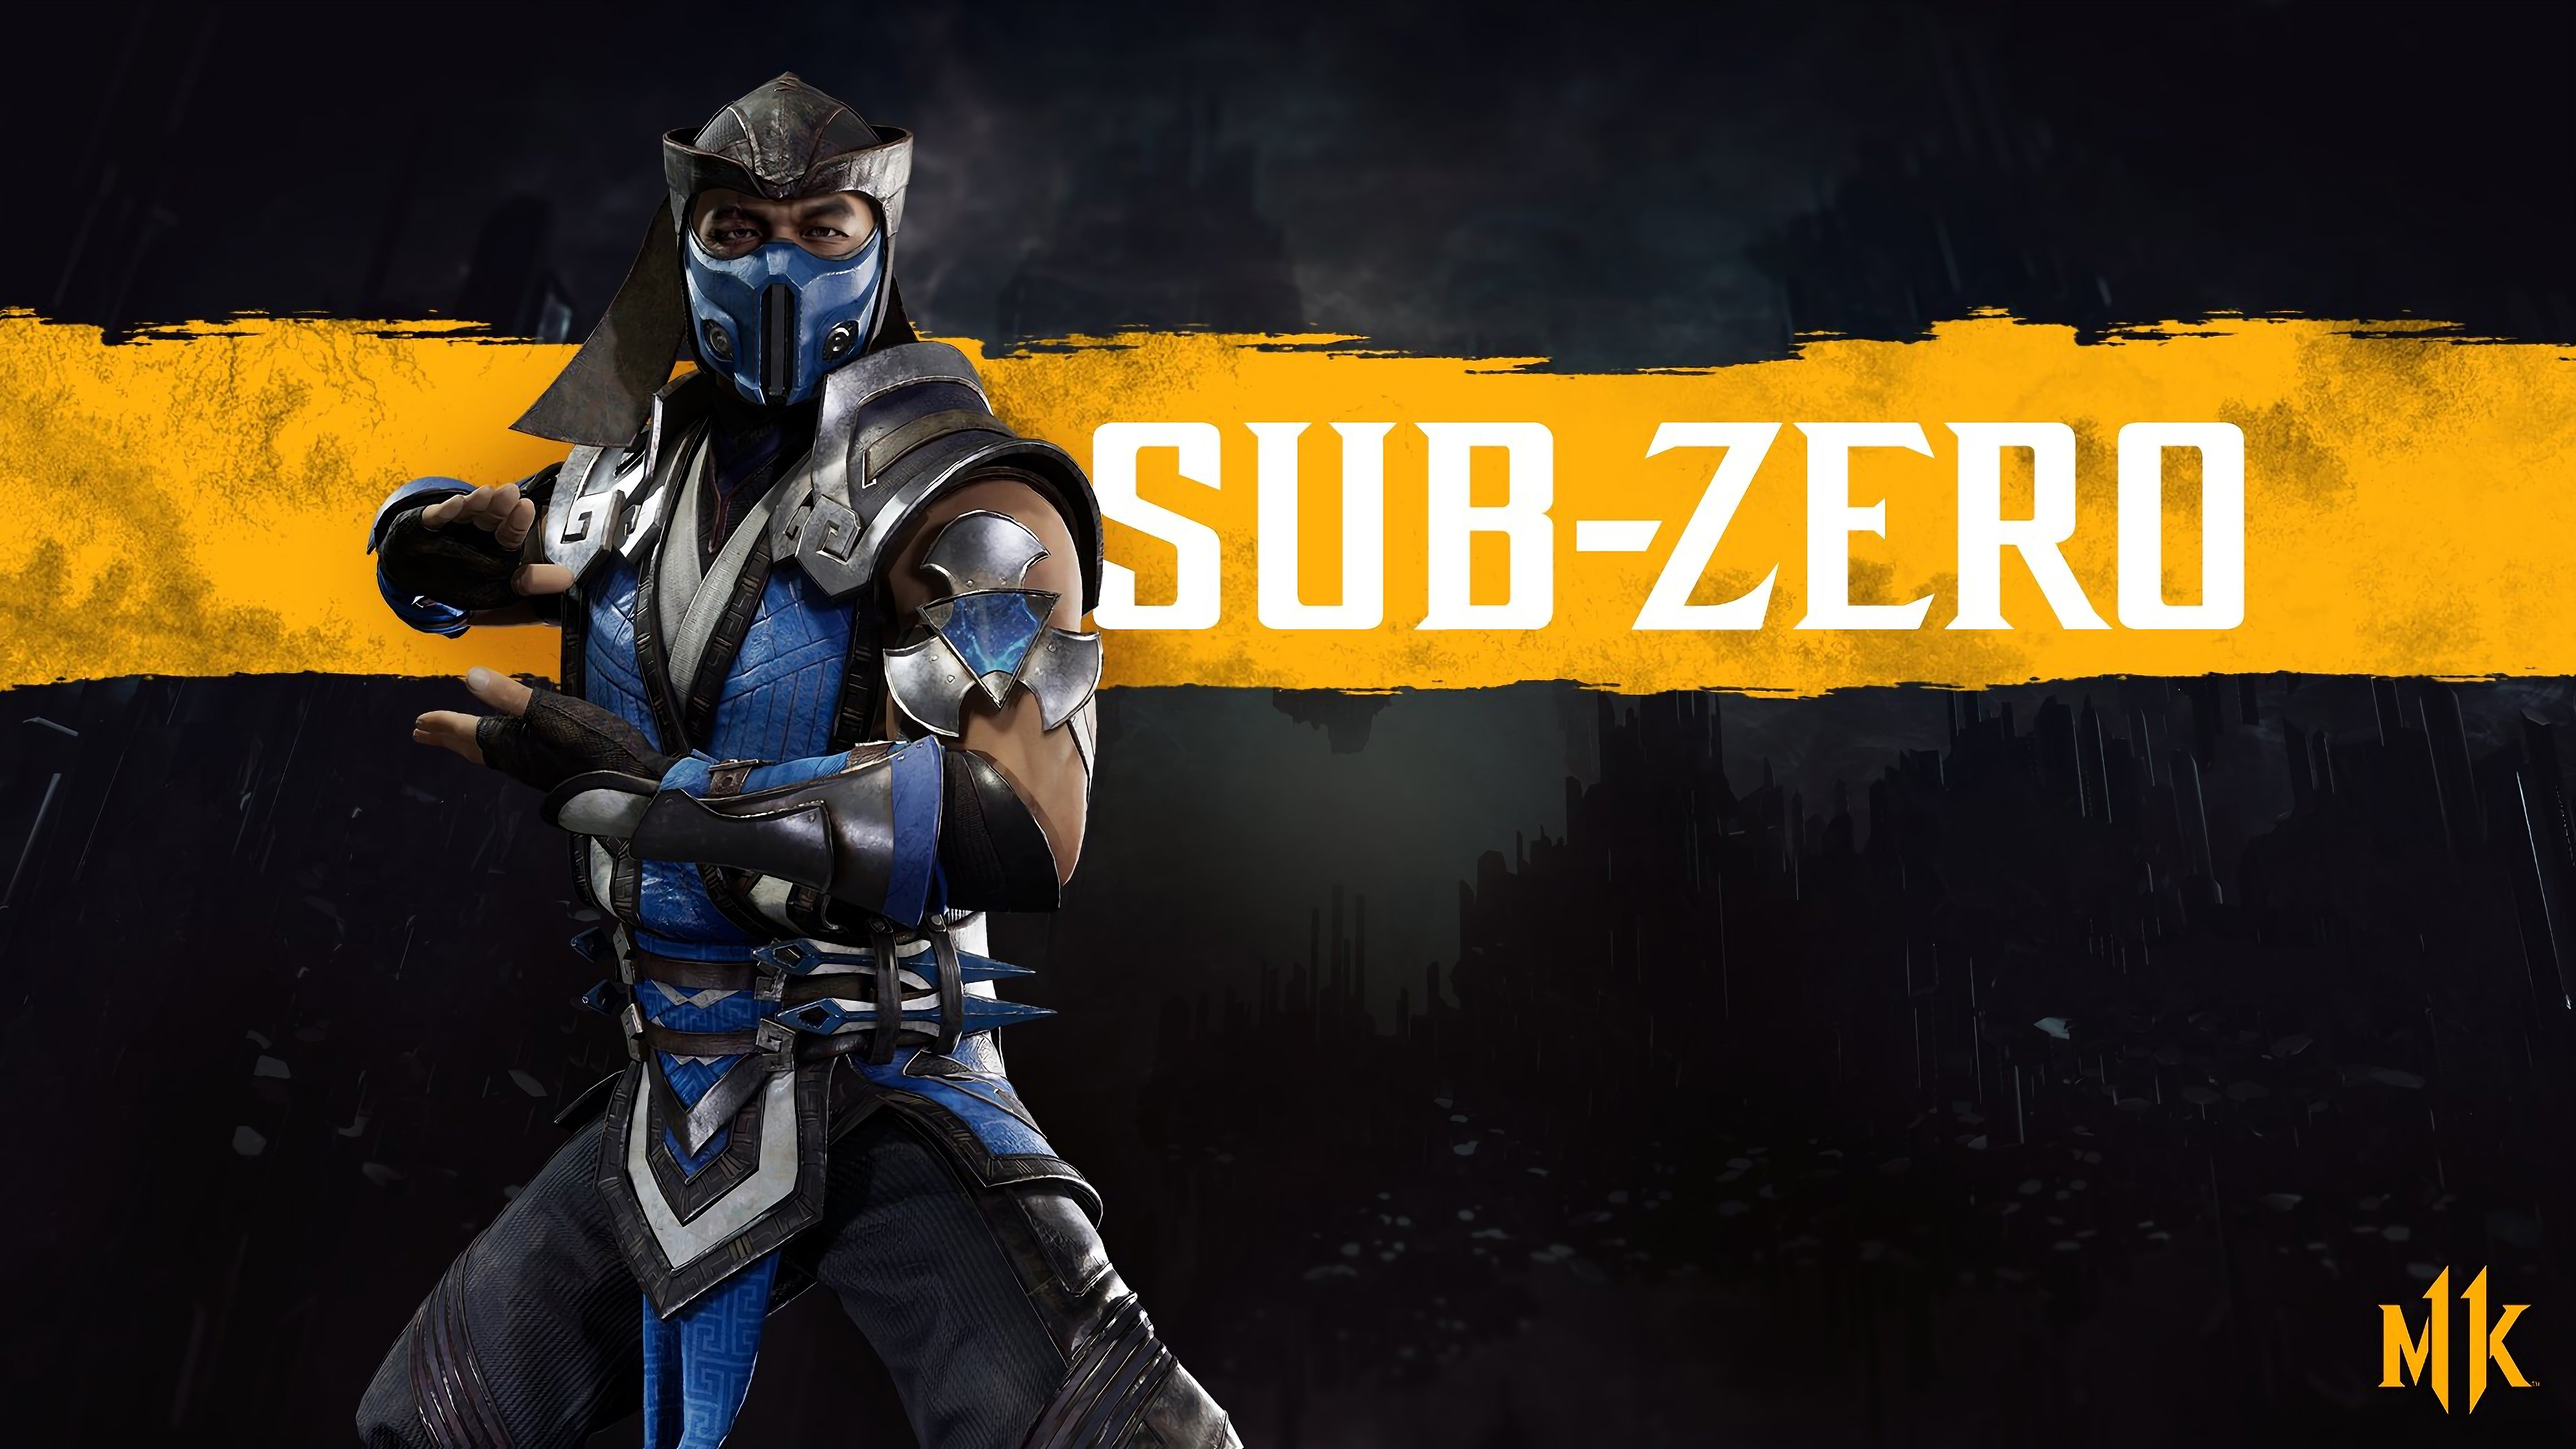 Fondos de pantalla Sub Zero de Mortal Kombat